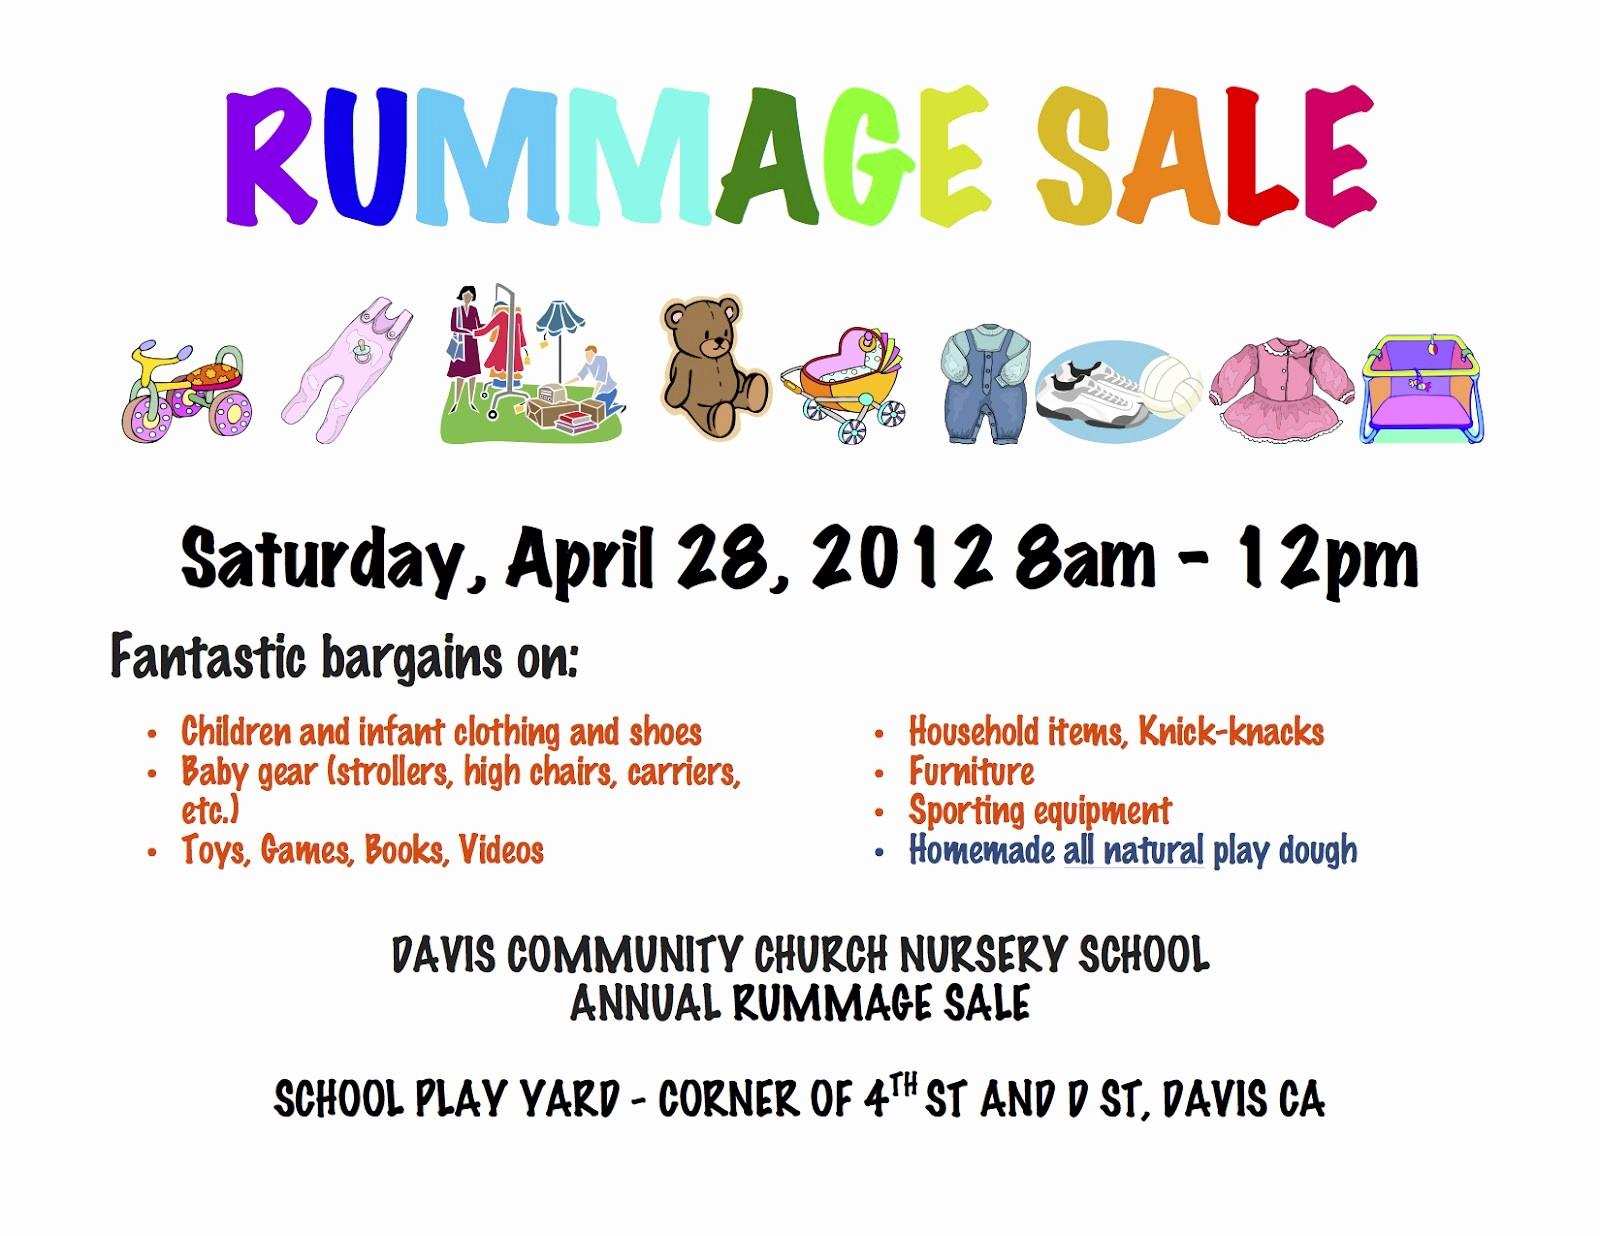 Free Printable Yard Sale Flyers Elegant Davis Ca Davis Munity Church Nursery School Dccns